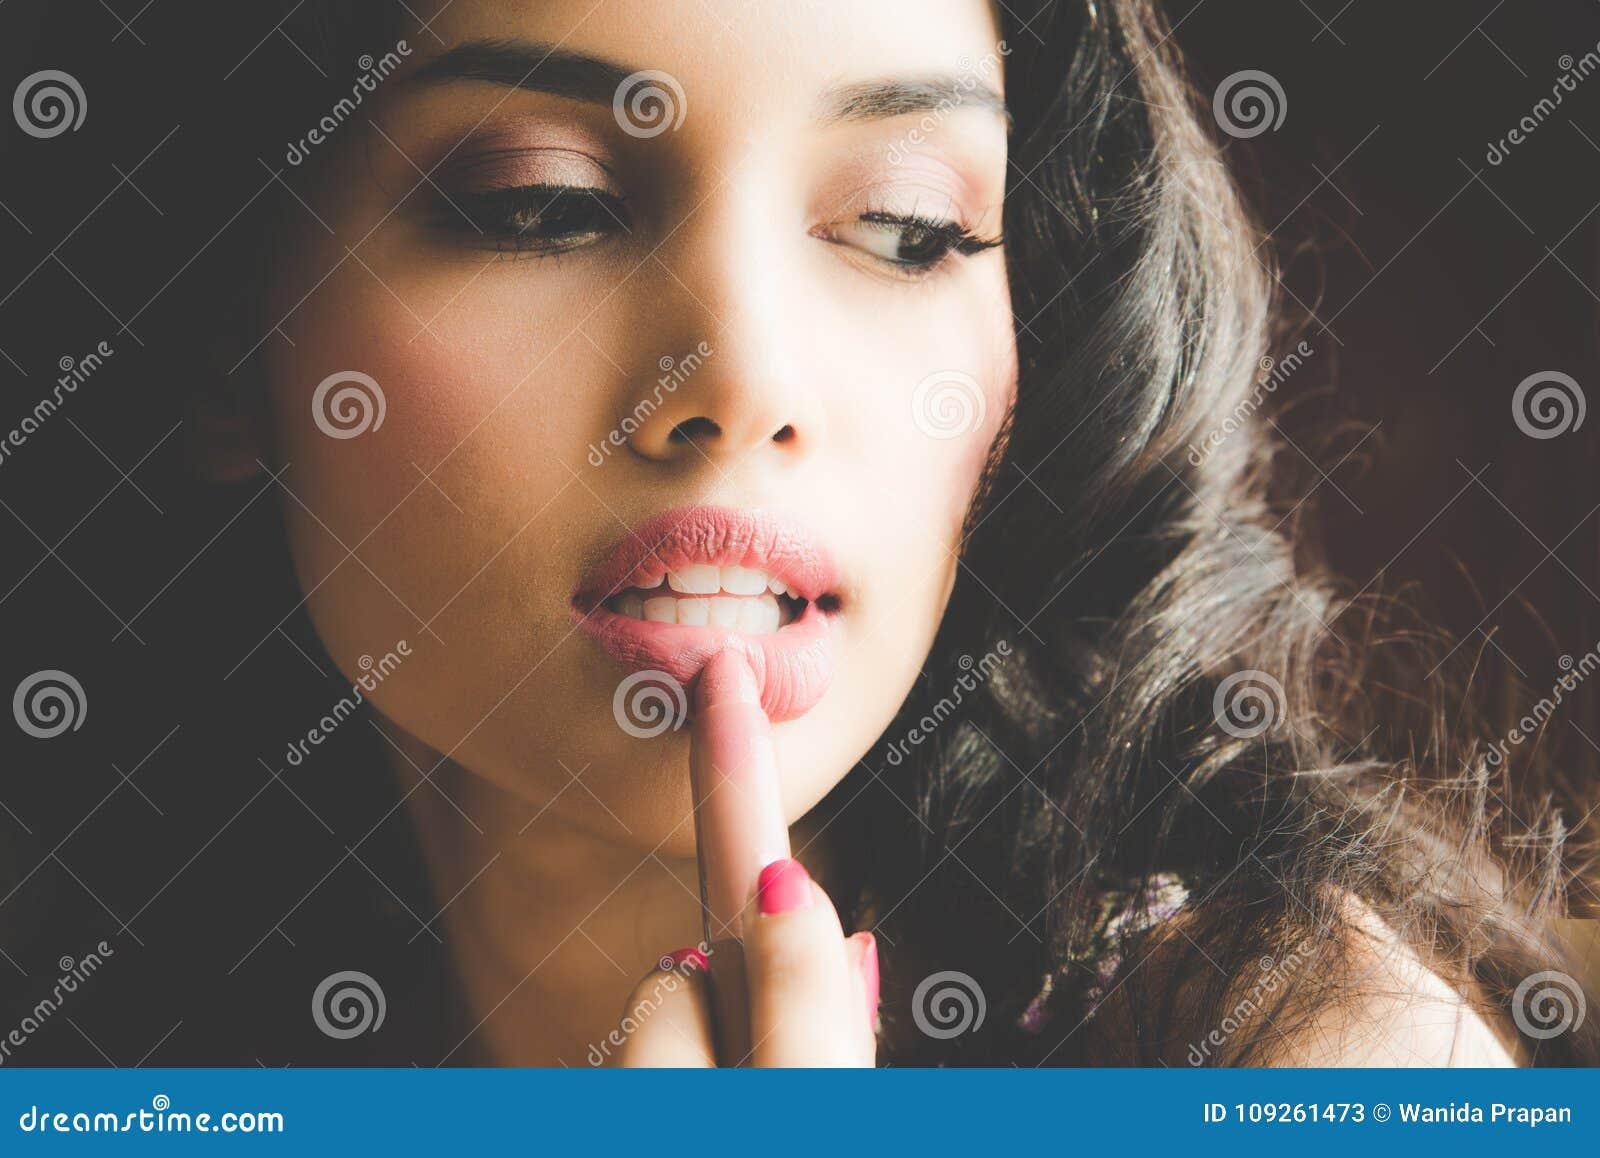 330a0f14a46 Όμορφη νέα γυναίκα πολυτέλειας που εφαρμόζει τη χειλική γραμμή Στοκ ...